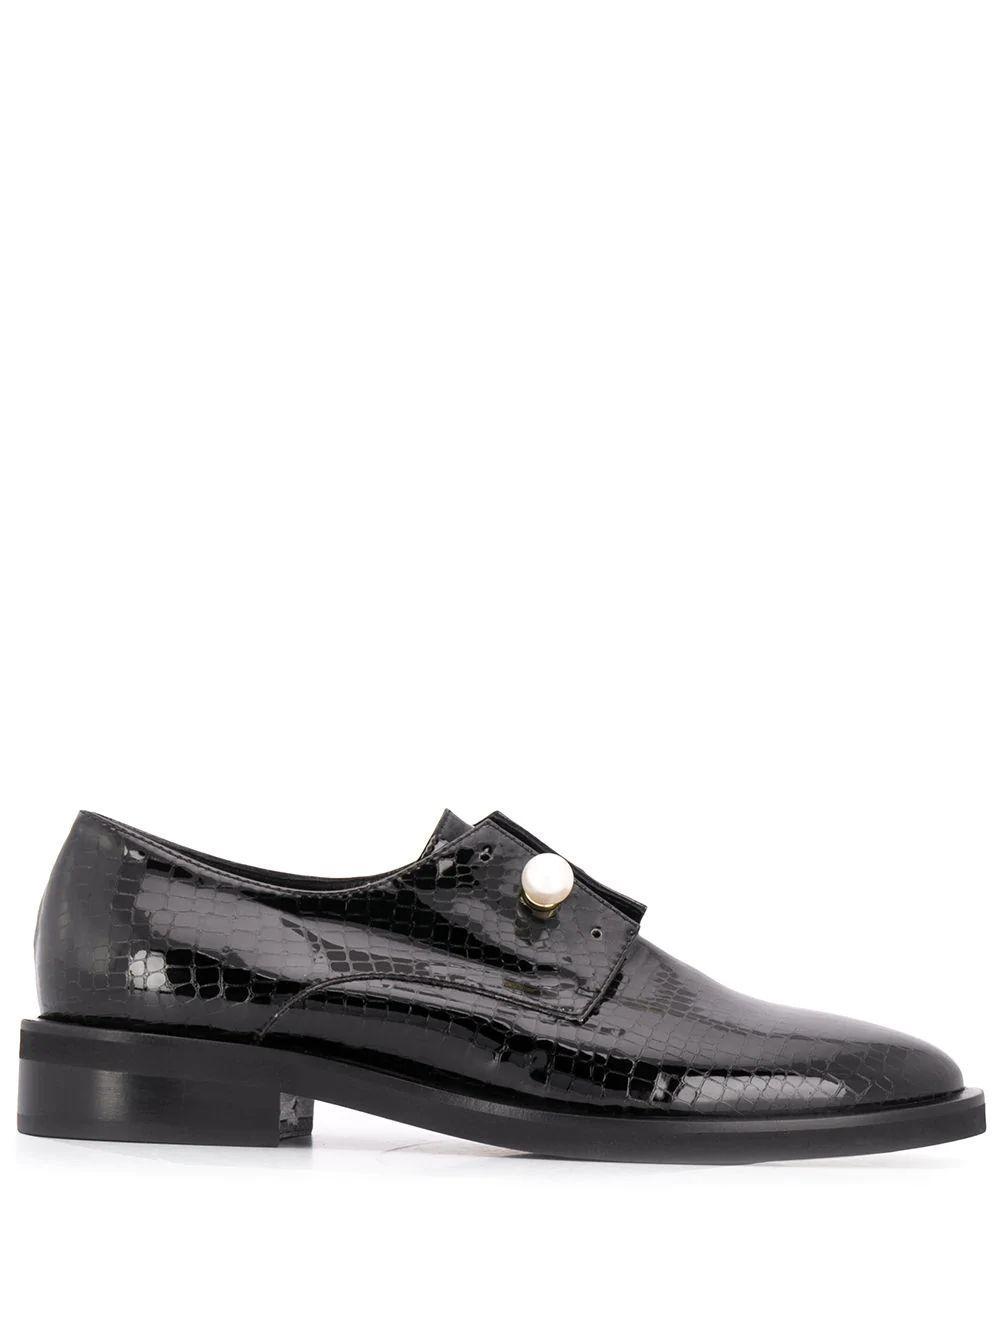 Ginevra Patent Loafer Item # CL2234